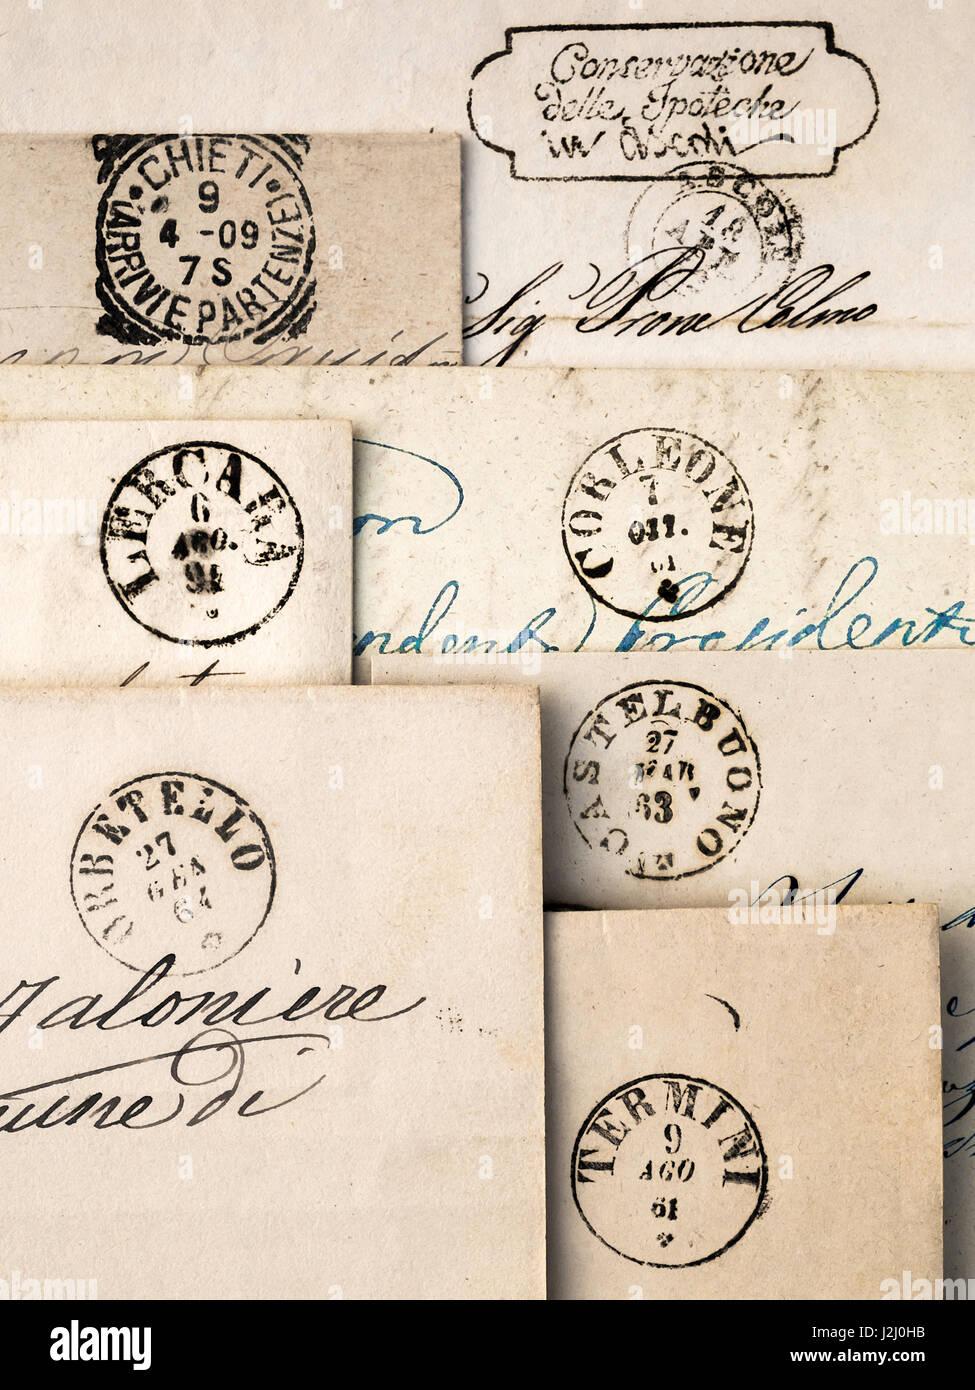 Early 19th century hand-written Italian envelopes. - Stock Image